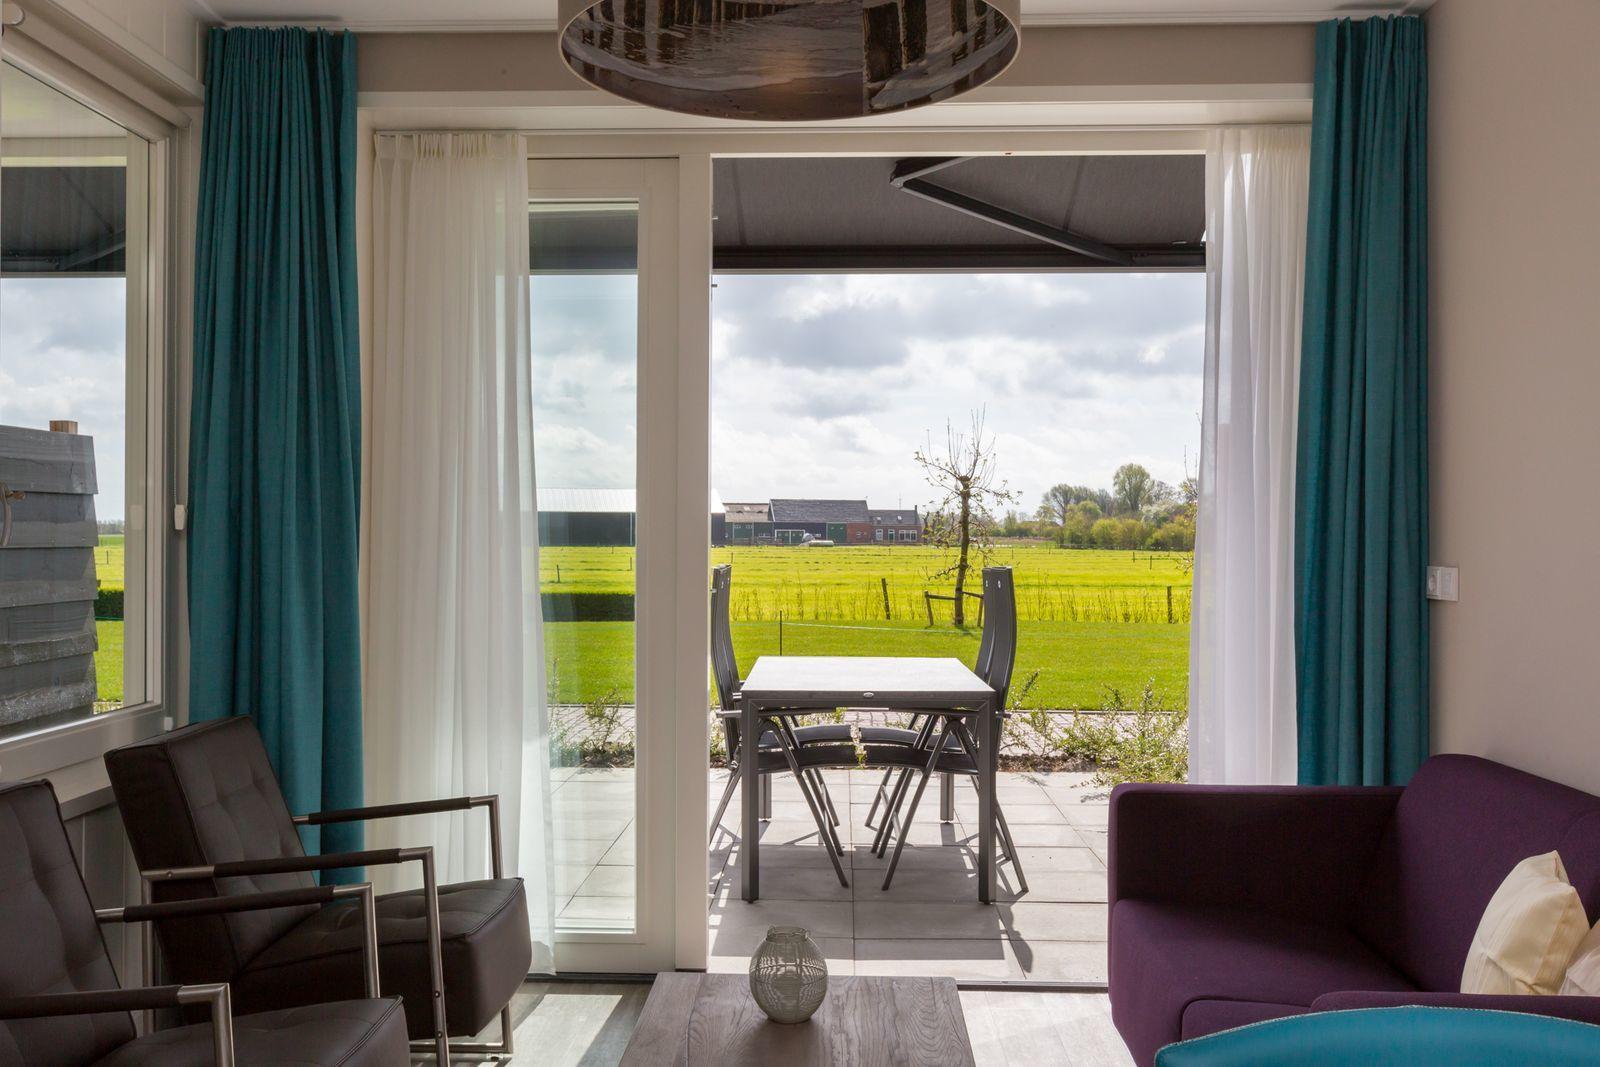 "Ferienwohnung - Noordweg 56a | Oostkapelle ""Comfort 4 personen"""